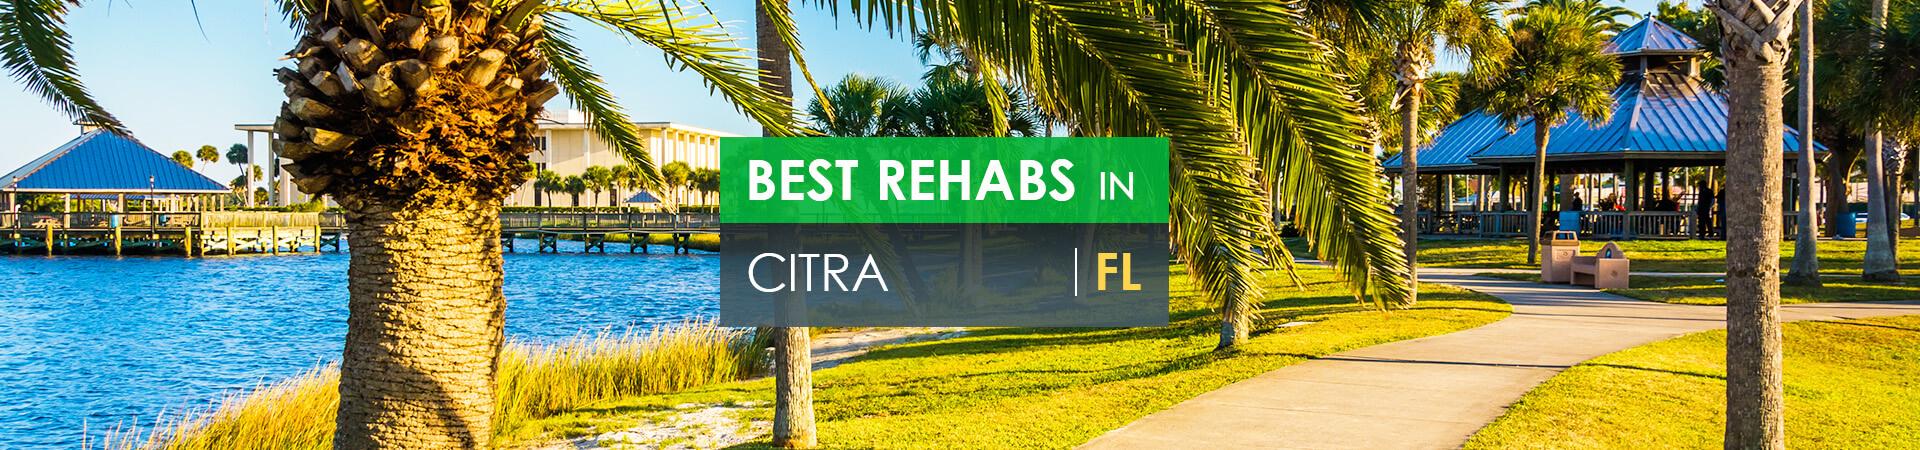 Best rehabs in Citra, FL